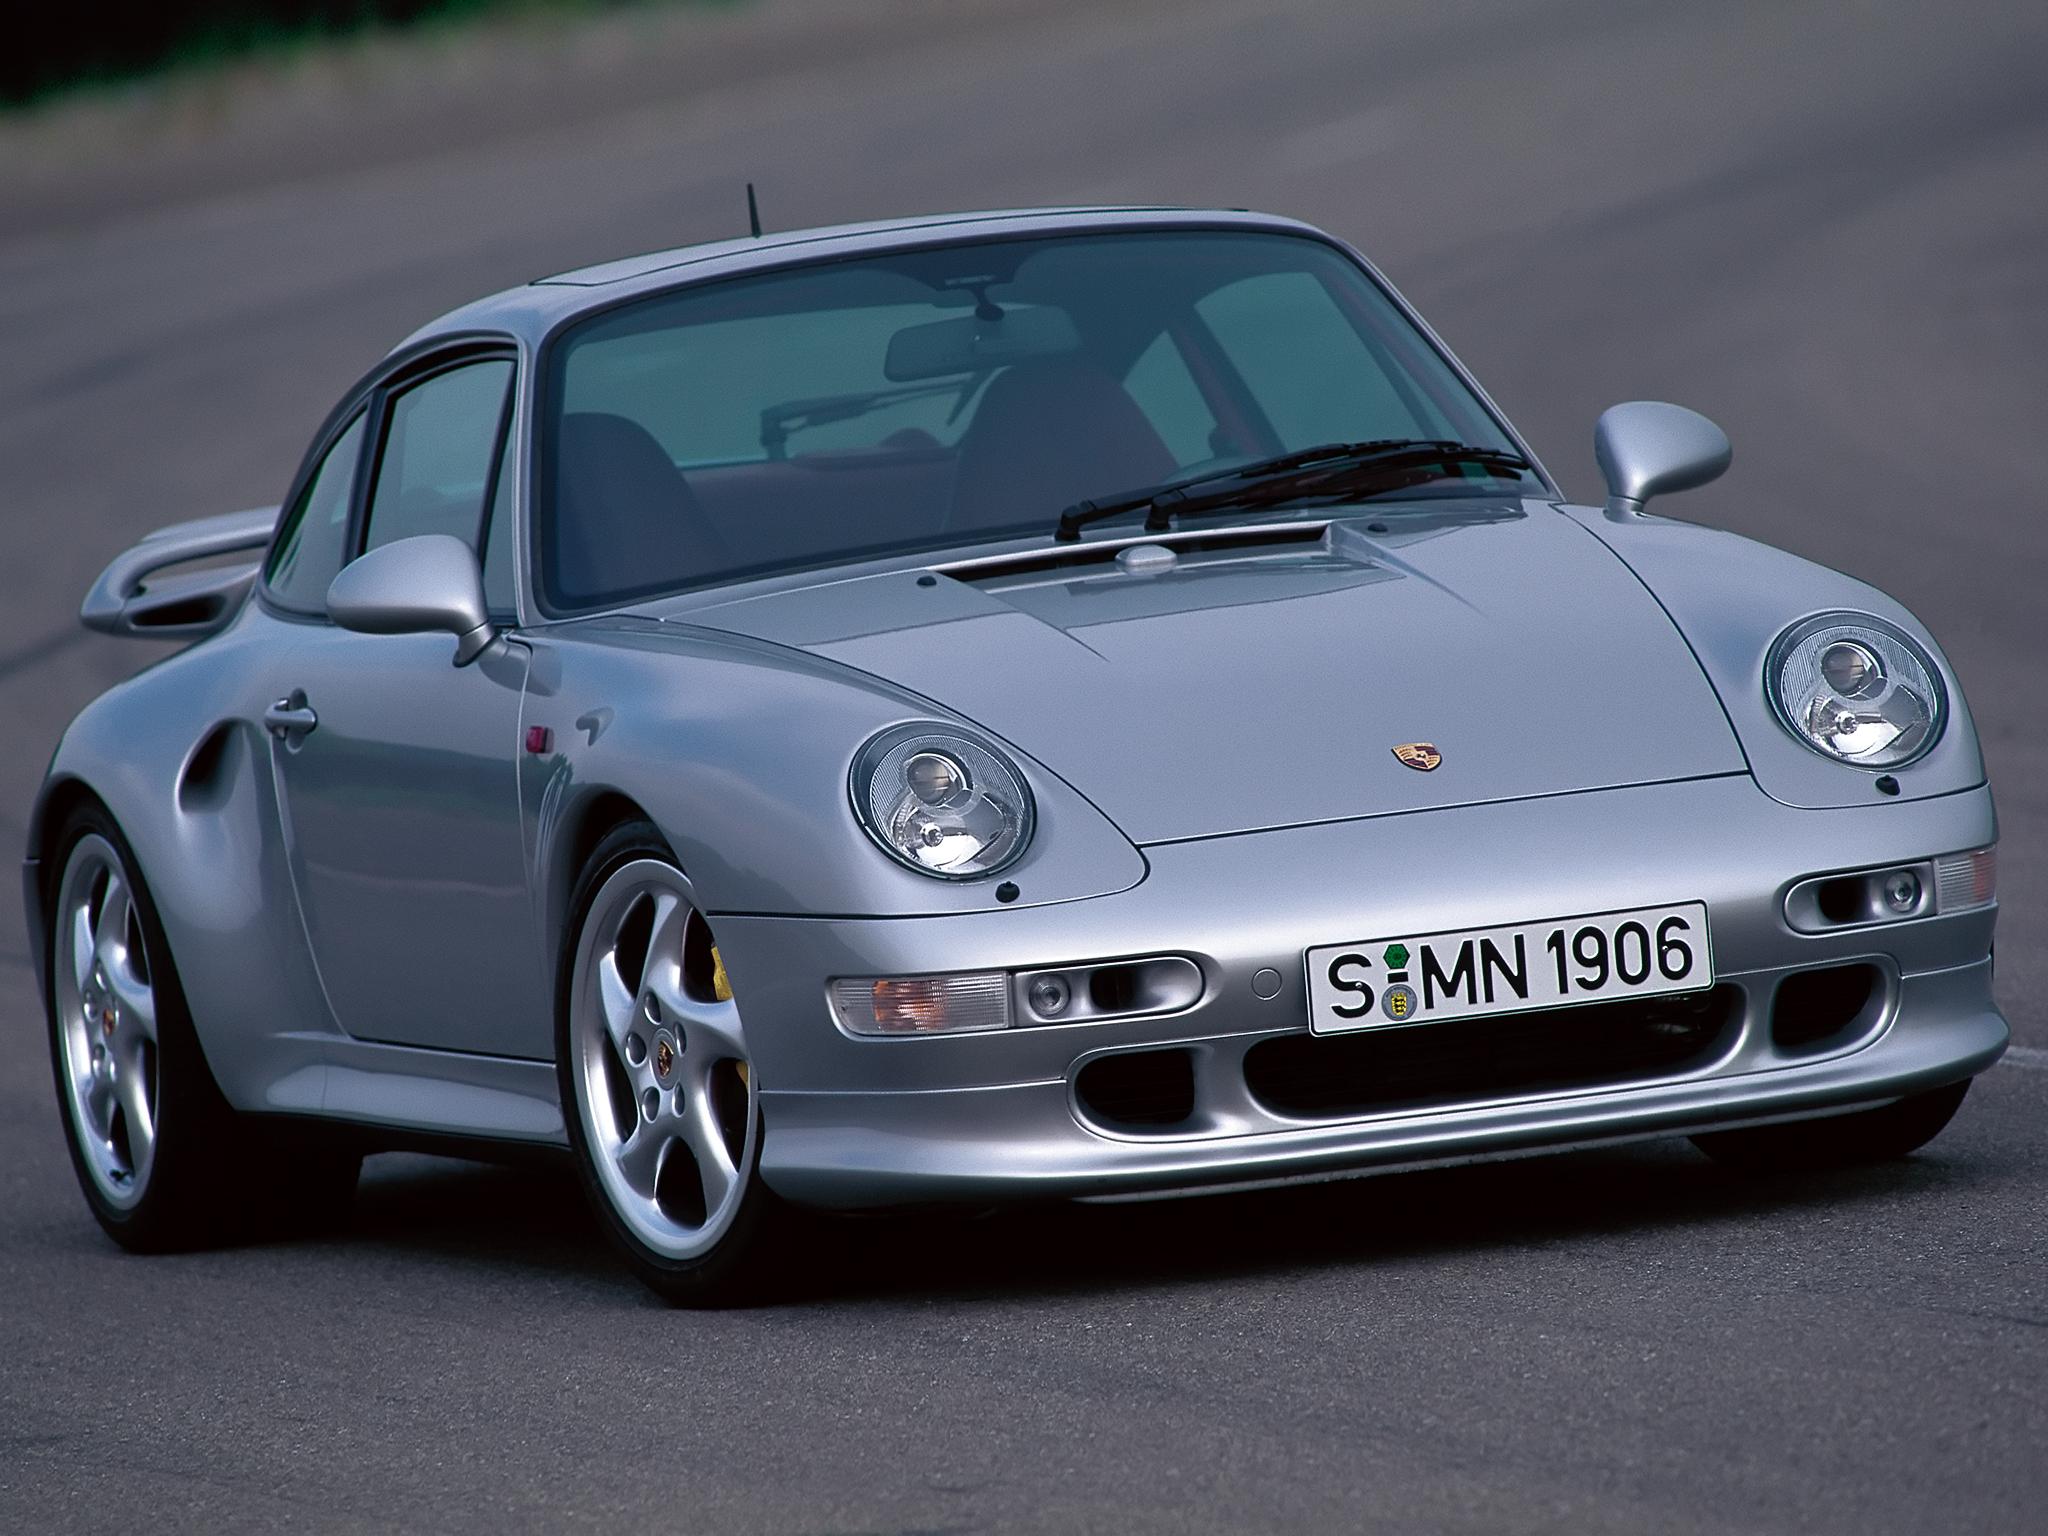 1998 Porsche 911 Image 14